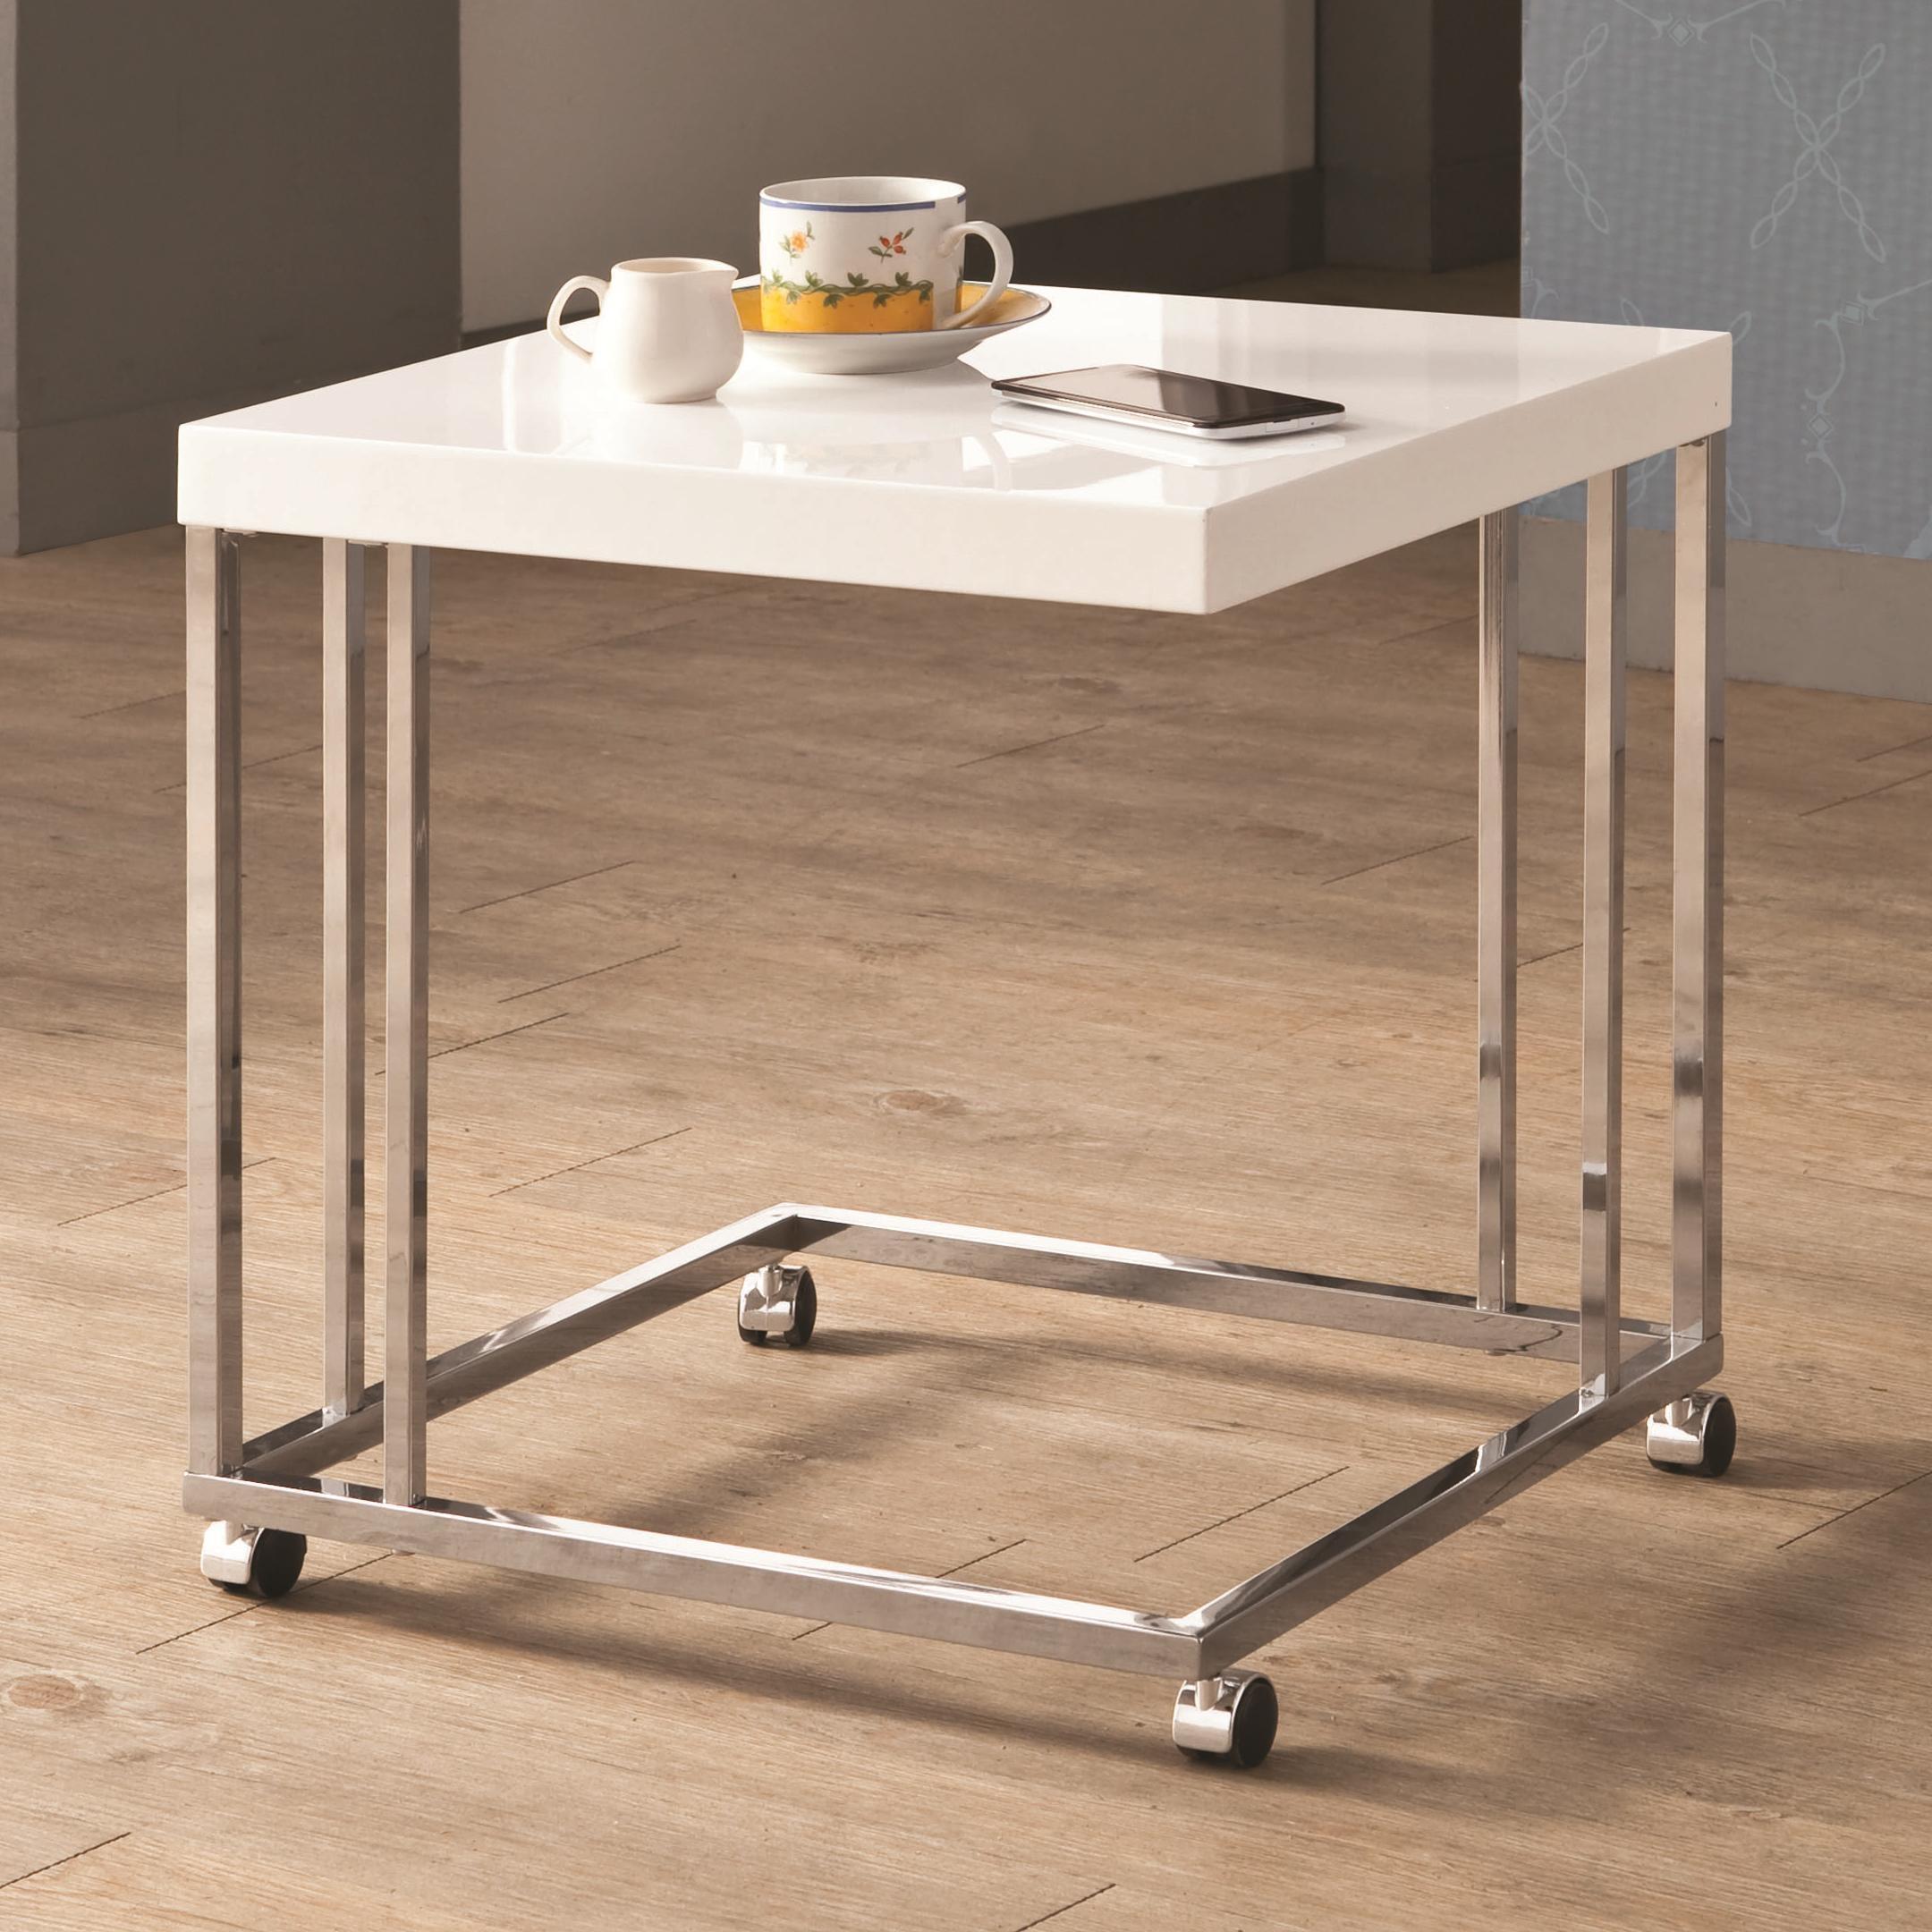 table under sofa mercado libre mexico cama individual 20 inspirations tray tables ideas